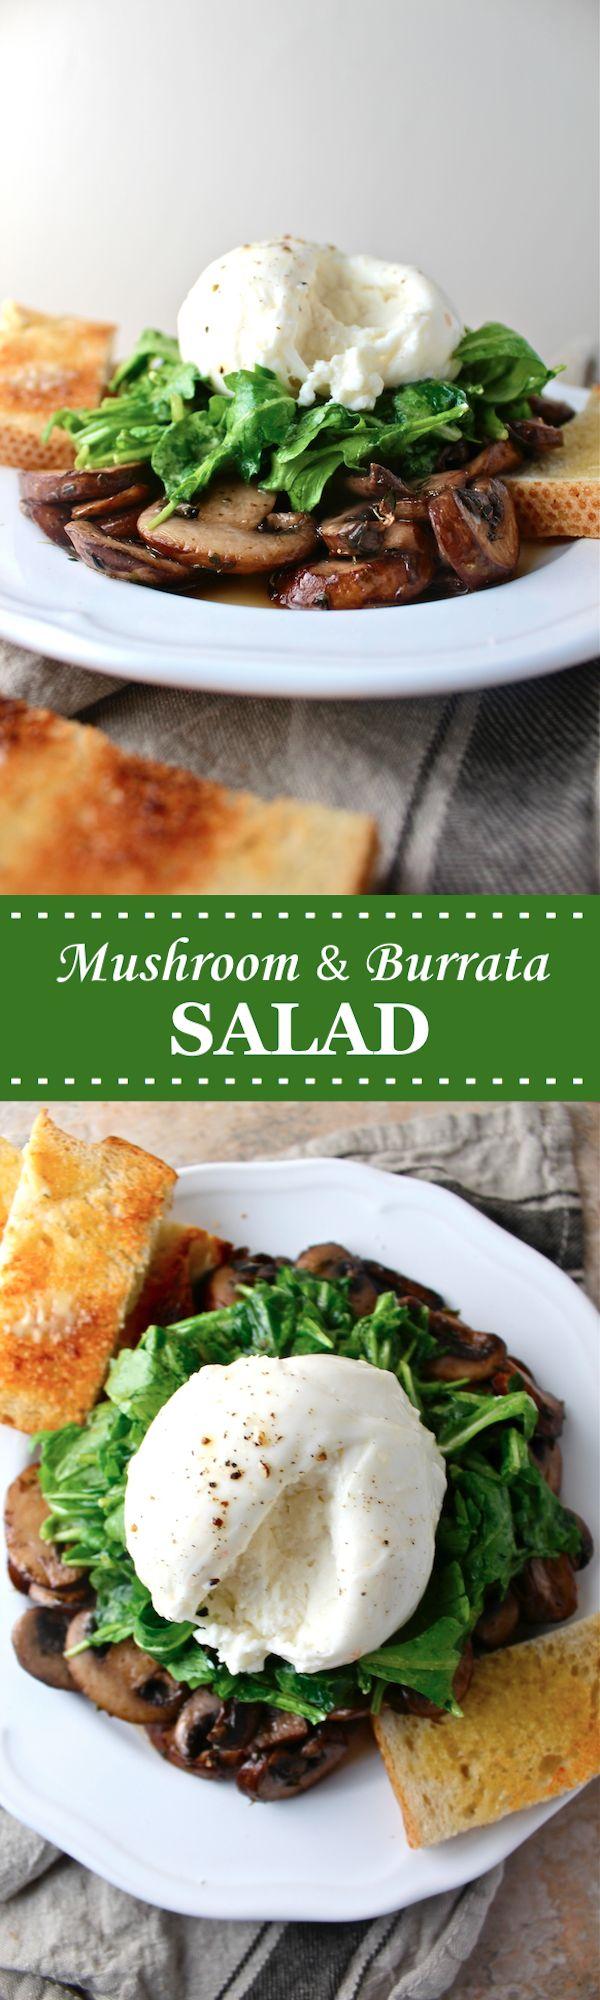 This Mushroom & Burrata Salad is loaded with creamy, sumptuous cheese and buttery, sautéed mushrooms - the dish of my dreams! | The Millennial Cook #salad #arugula #mushroom #burrata #italian